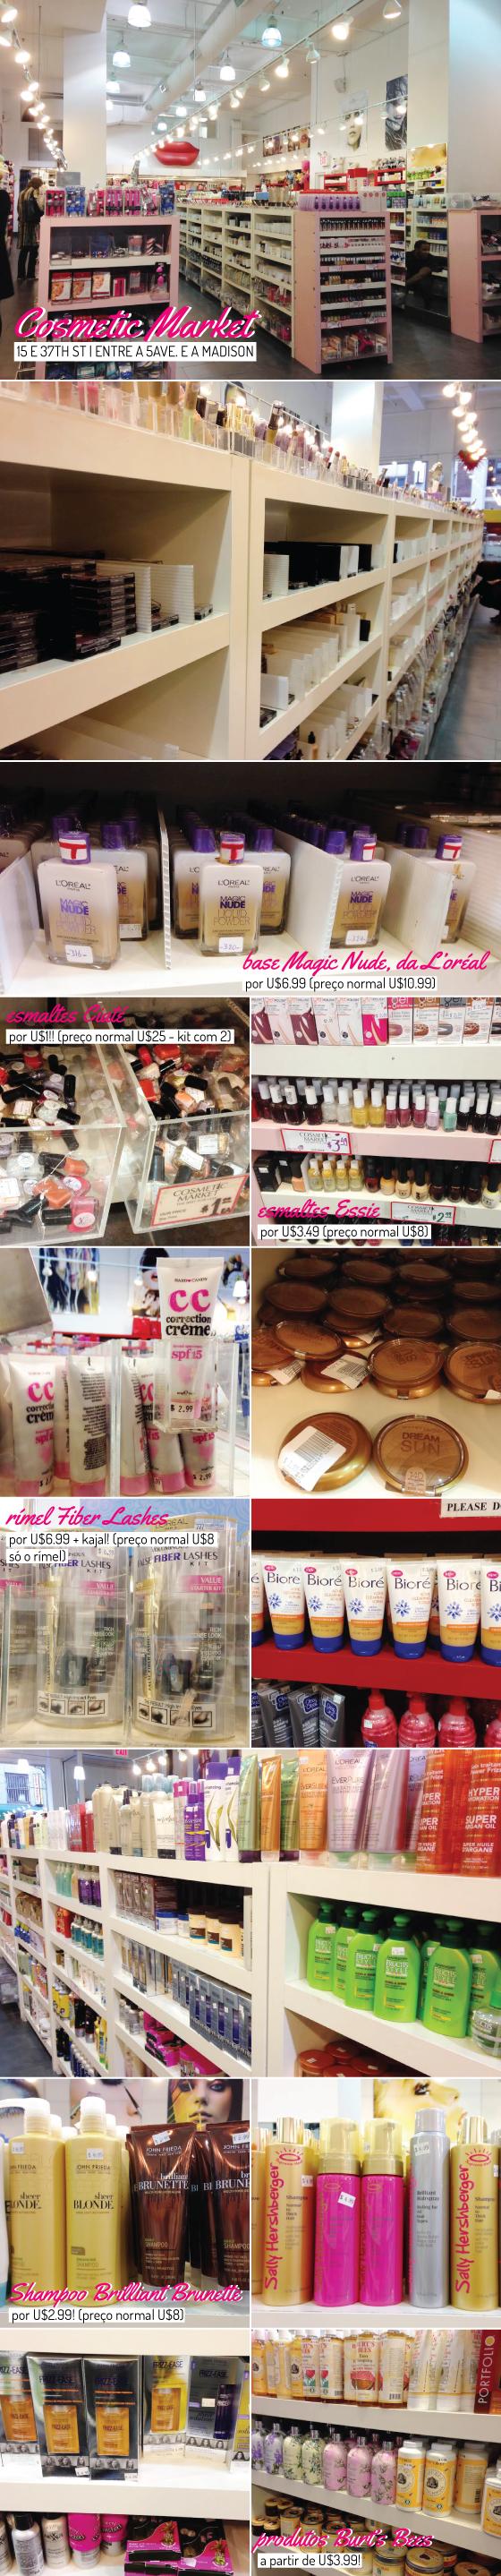 cosmetic-market-loja-cosmetico-maquiagem-produto-cabelo-beleza-beauty-dica-onde-ir-comprar-compras-barato-desconto-promocao-loreal-burts-bees-maybelline-essie-esmalte-john-frieda-ny-new-york-dica-dicas-viagem-tips-nova-iorque